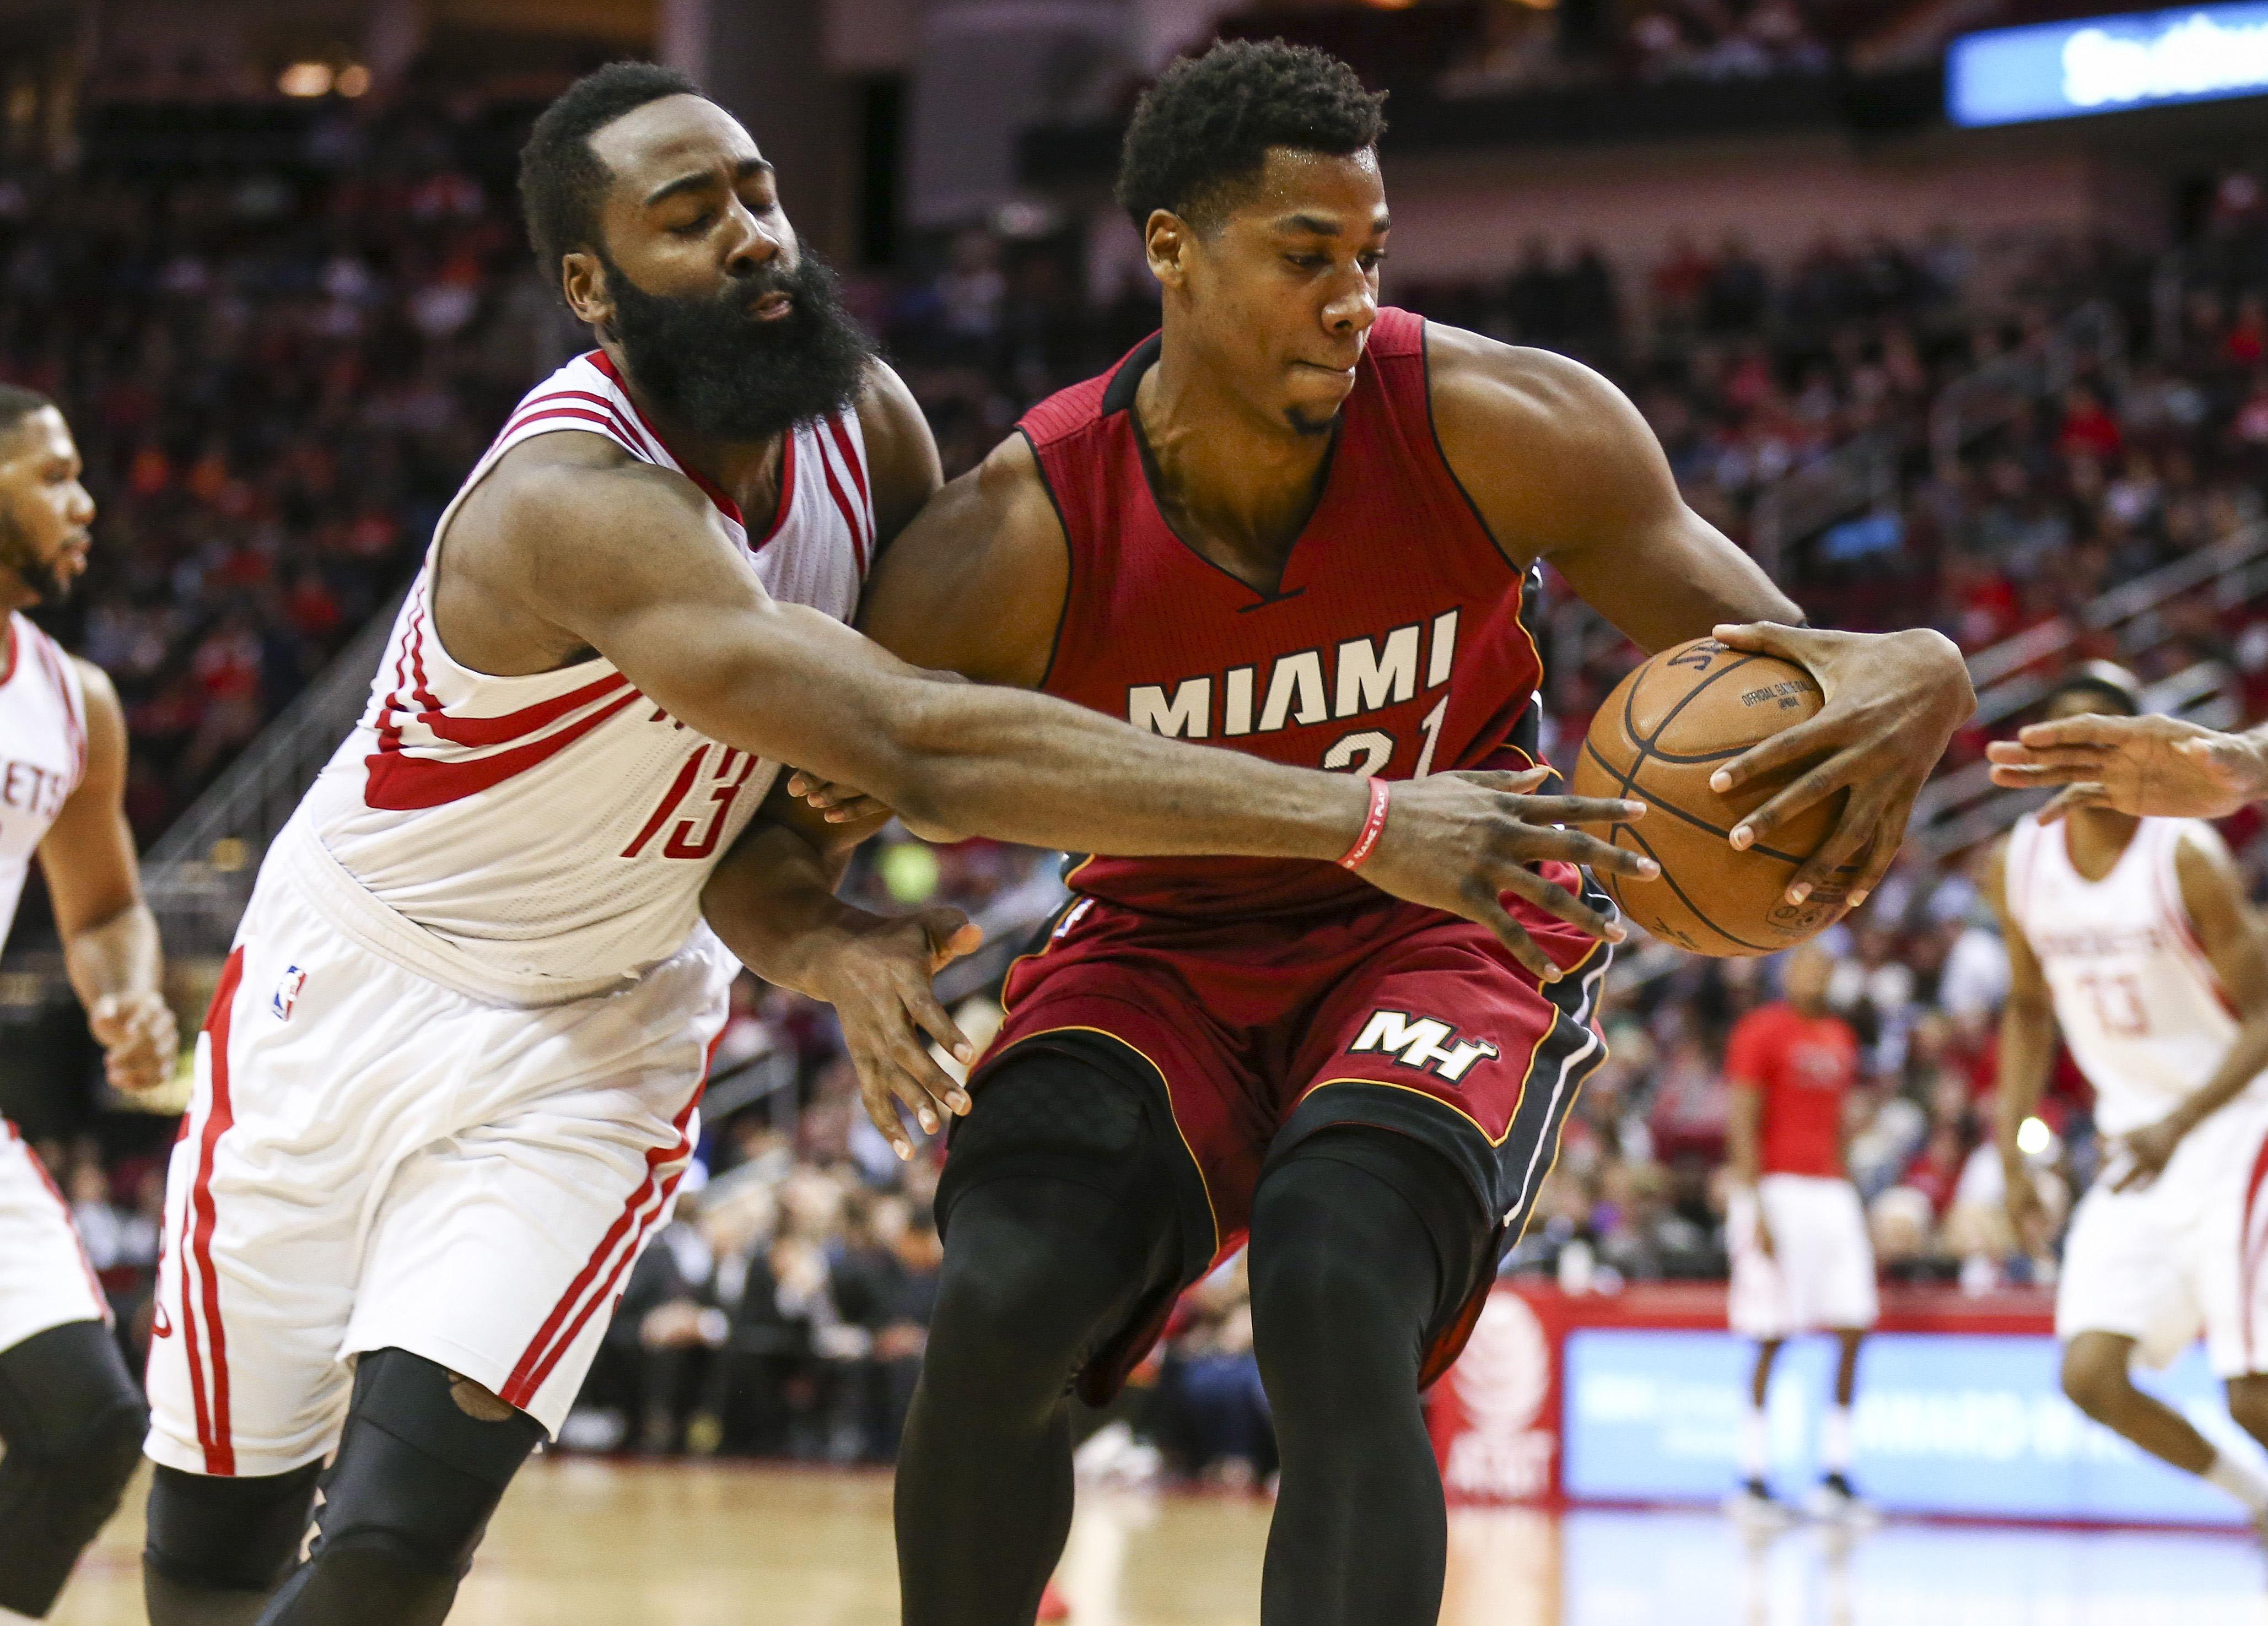 Se season tickets for houston rockets - Houston Rockets Vs Miami Heat Tickets Houston Rockets Vs Miami Heat Tickets 0